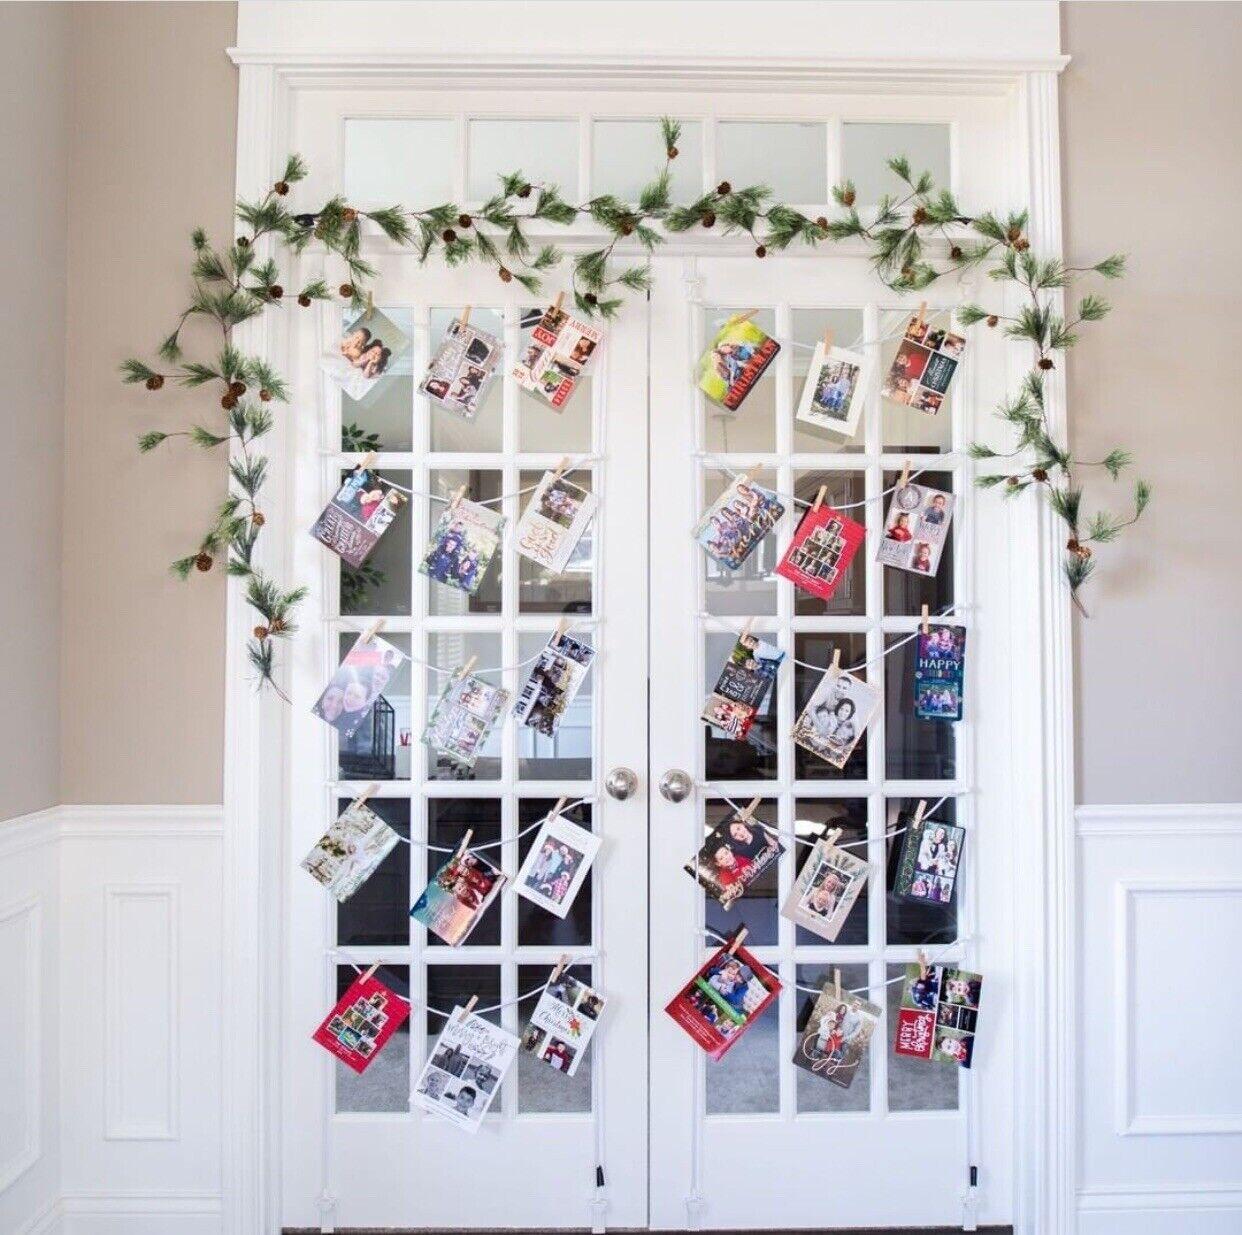 Christmas Star Design Over The Door Greeting Card Holder Display Organizer For Sale Online Ebay